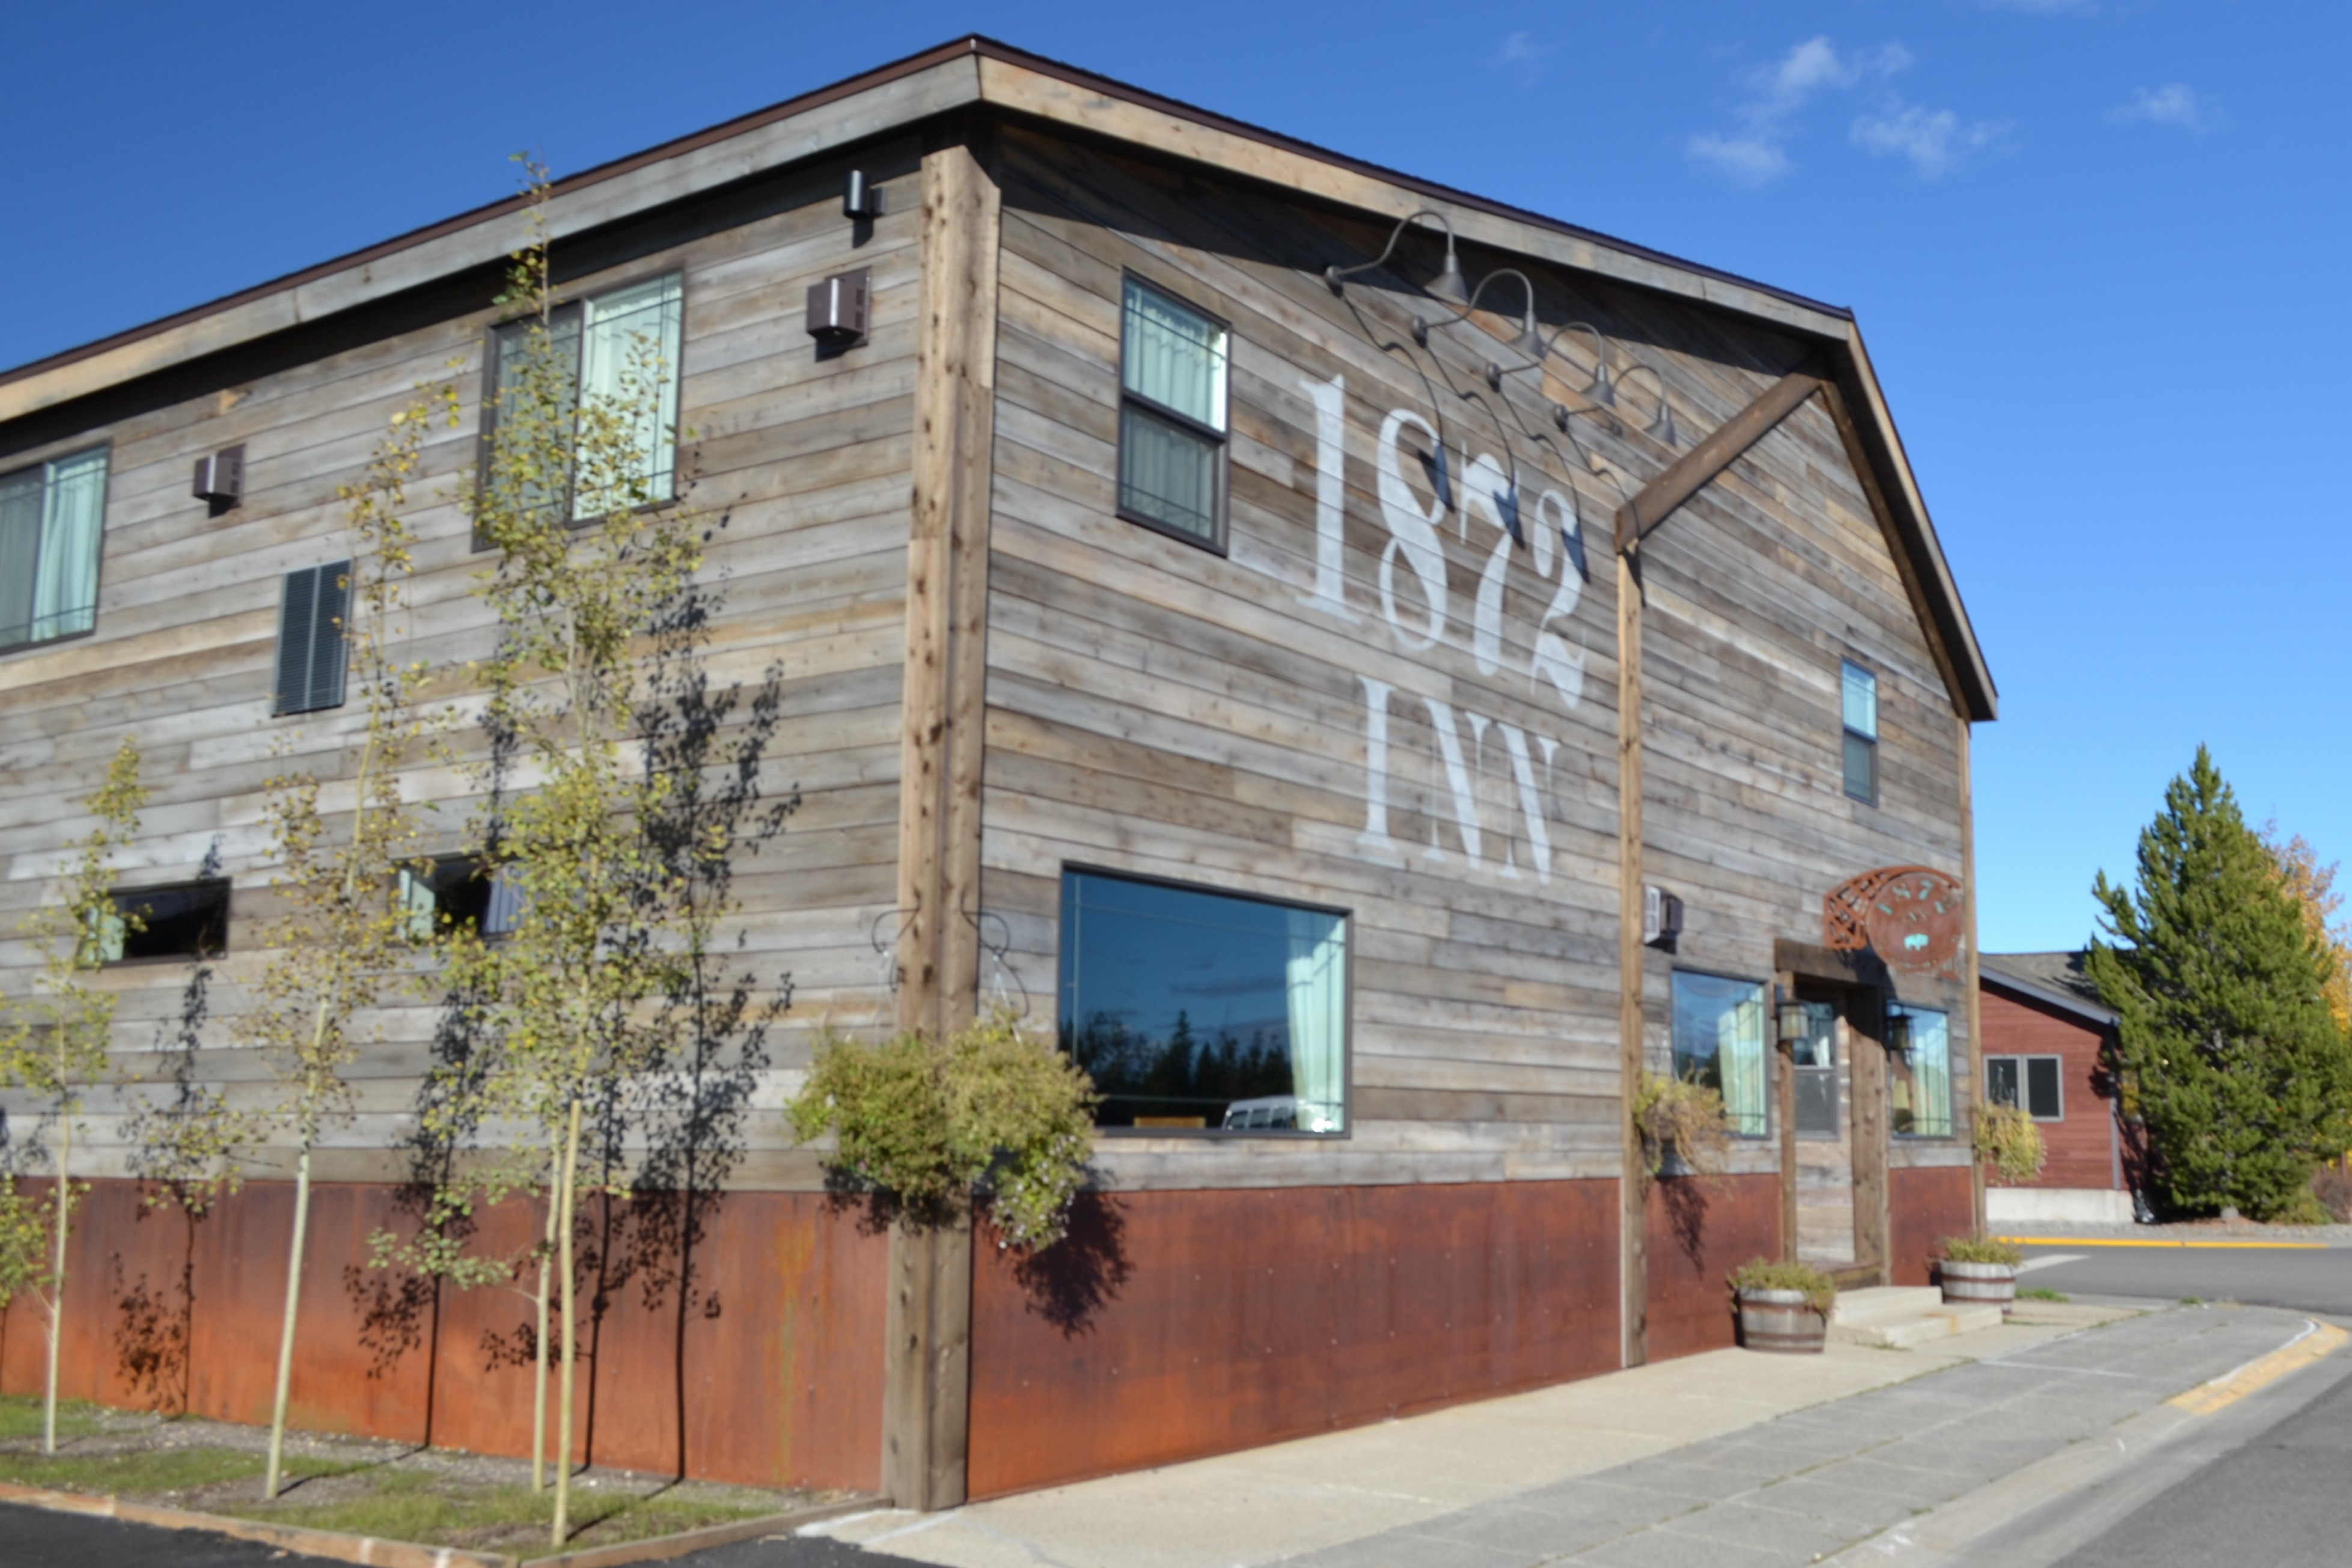 1872 Inn: Rustic Elegance at Yellowstone's Doorstep